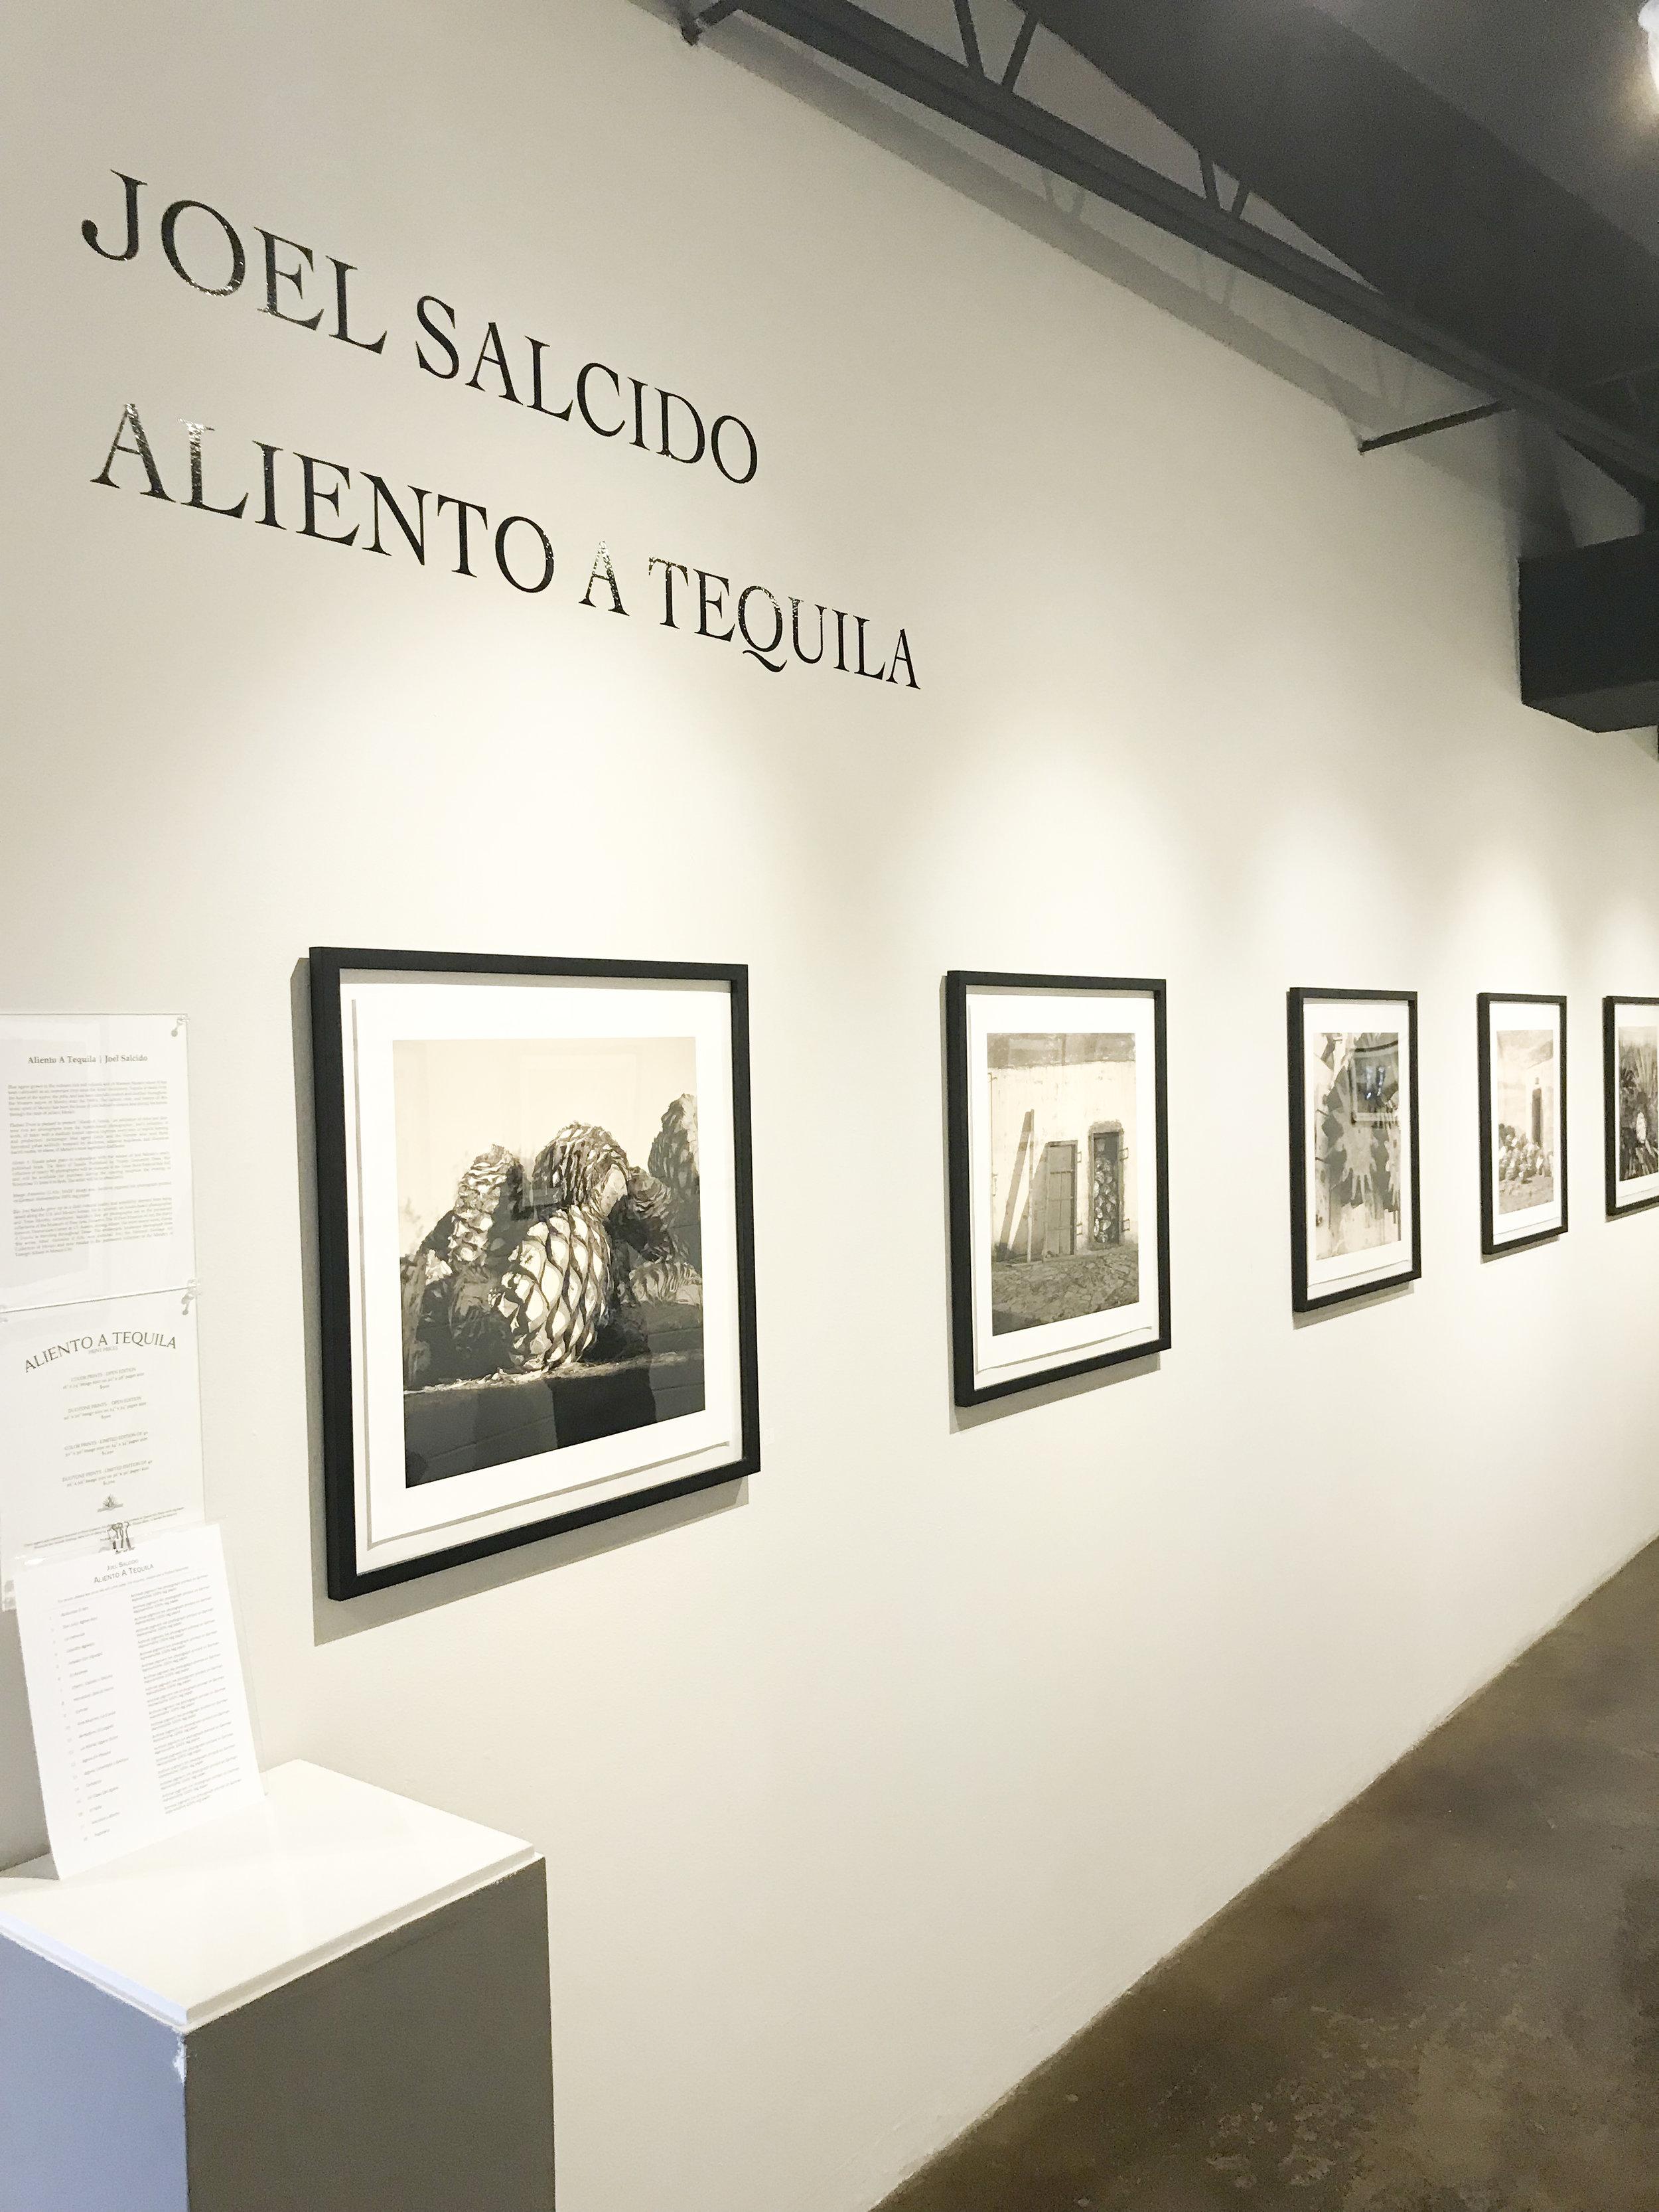 Joel Salcido at Gallery North